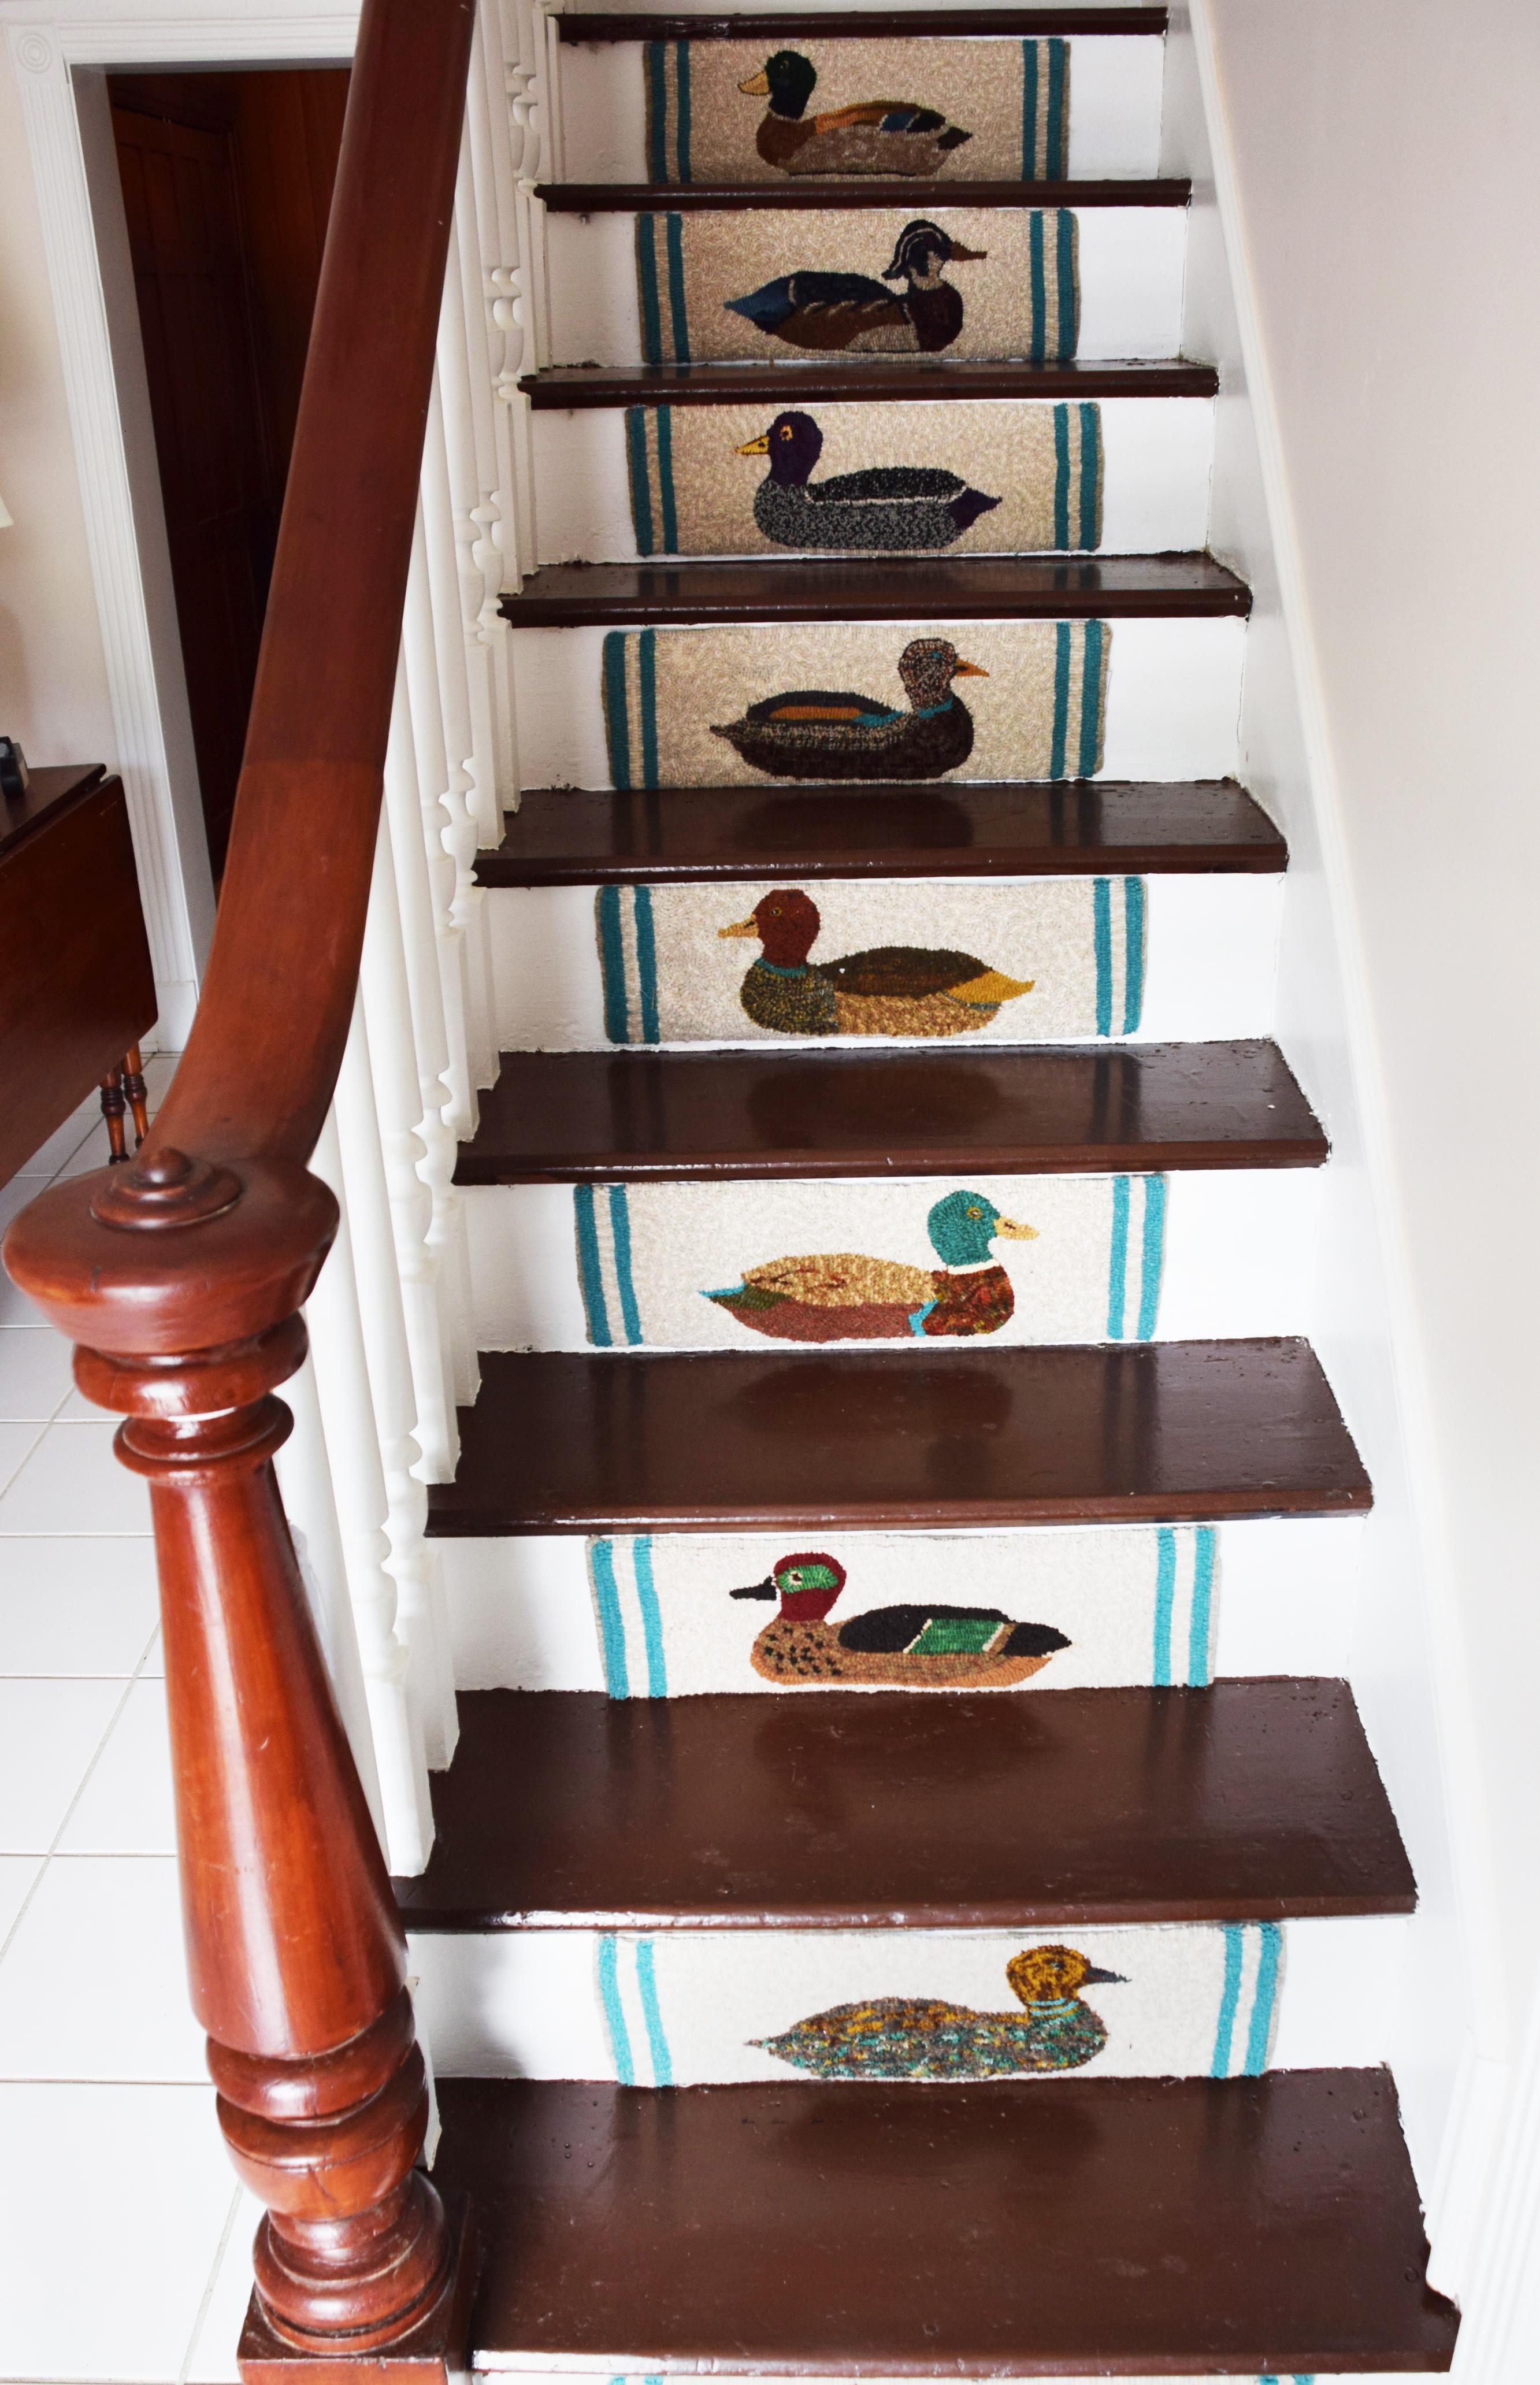 stairstep ducks full.jpg